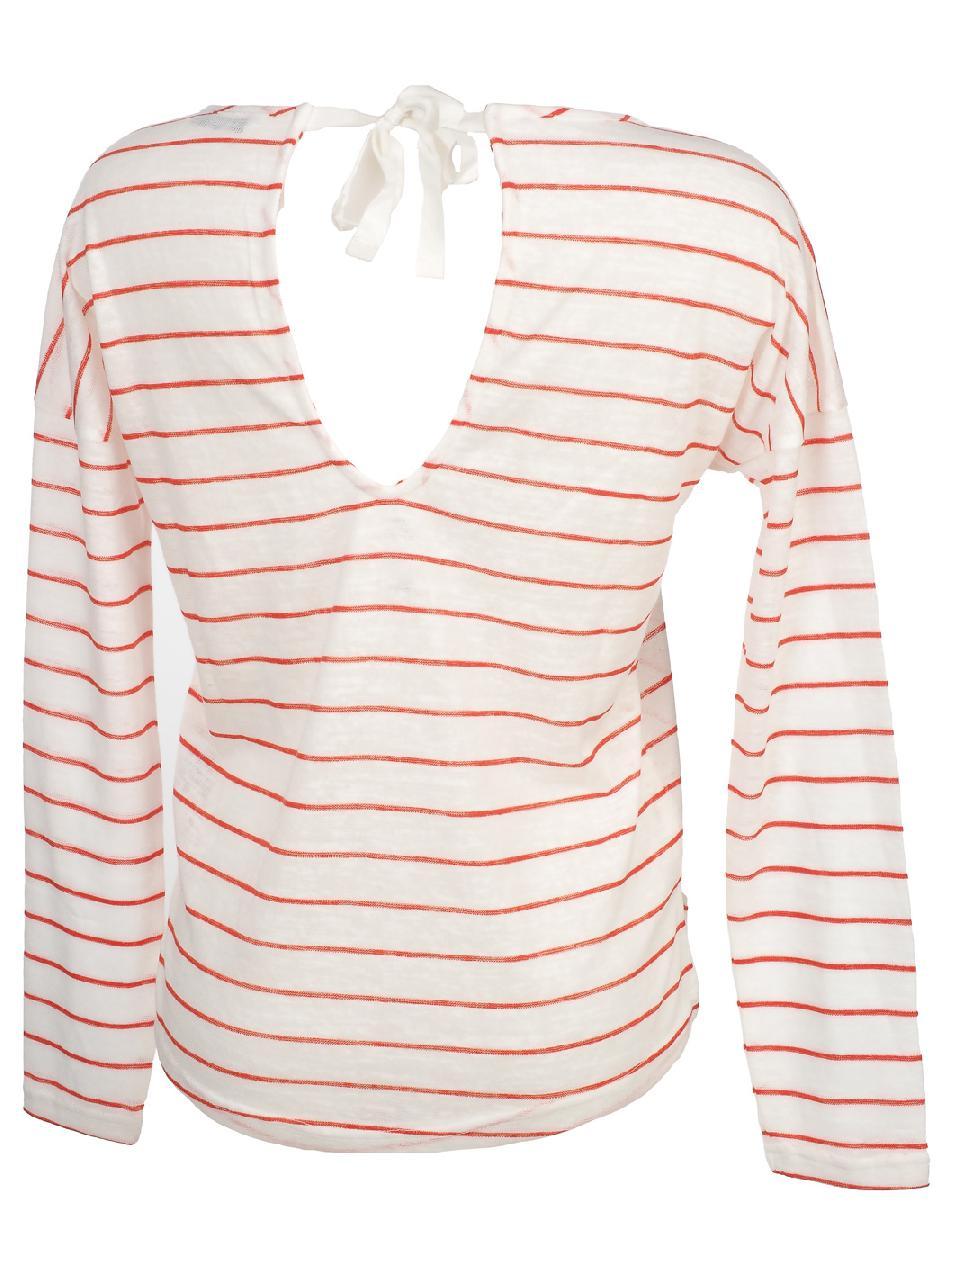 Tee-shirt-manches-longues-Only-Marina2-clouddancer-tee-l-Beige-54834-Neuf miniature 5